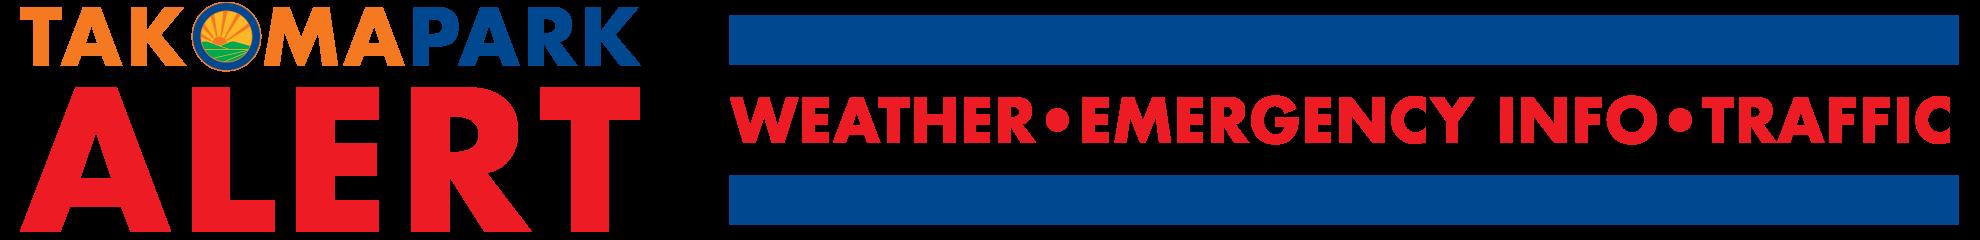 Takoma Park Alert Logo